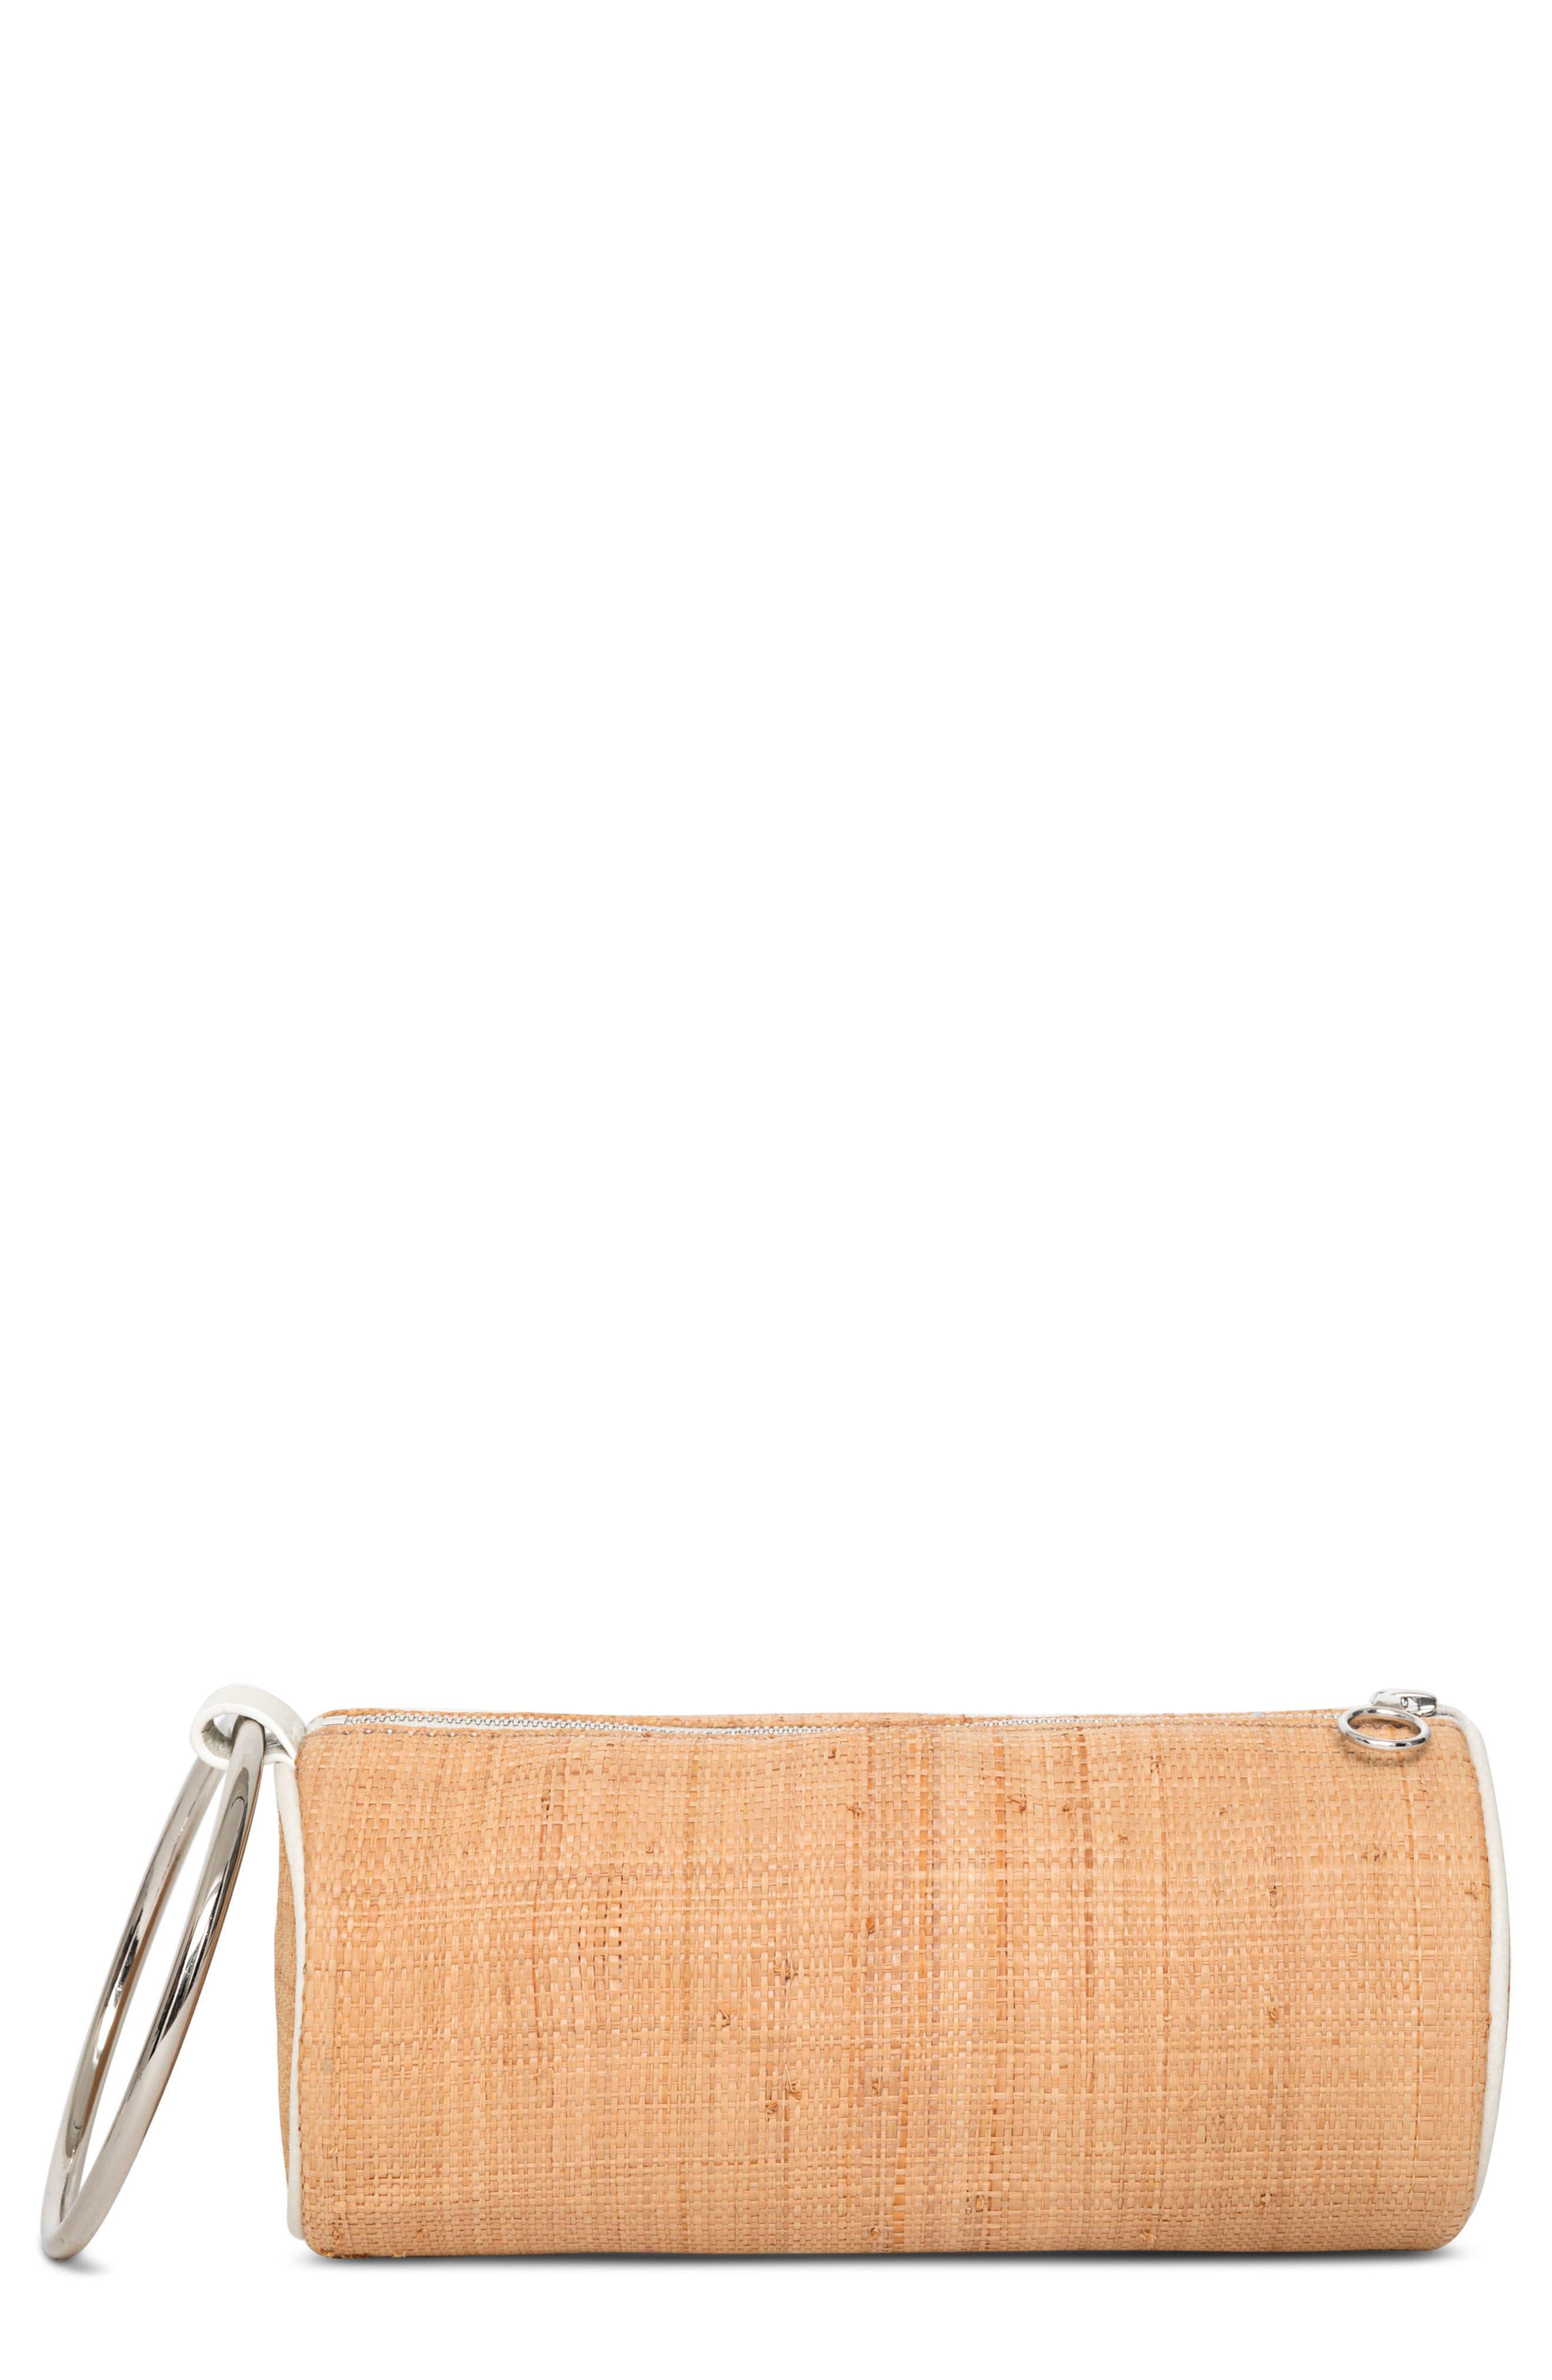 Straw Duffel Wristlet Clutch,                             Main thumbnail 1, color,                             Natural